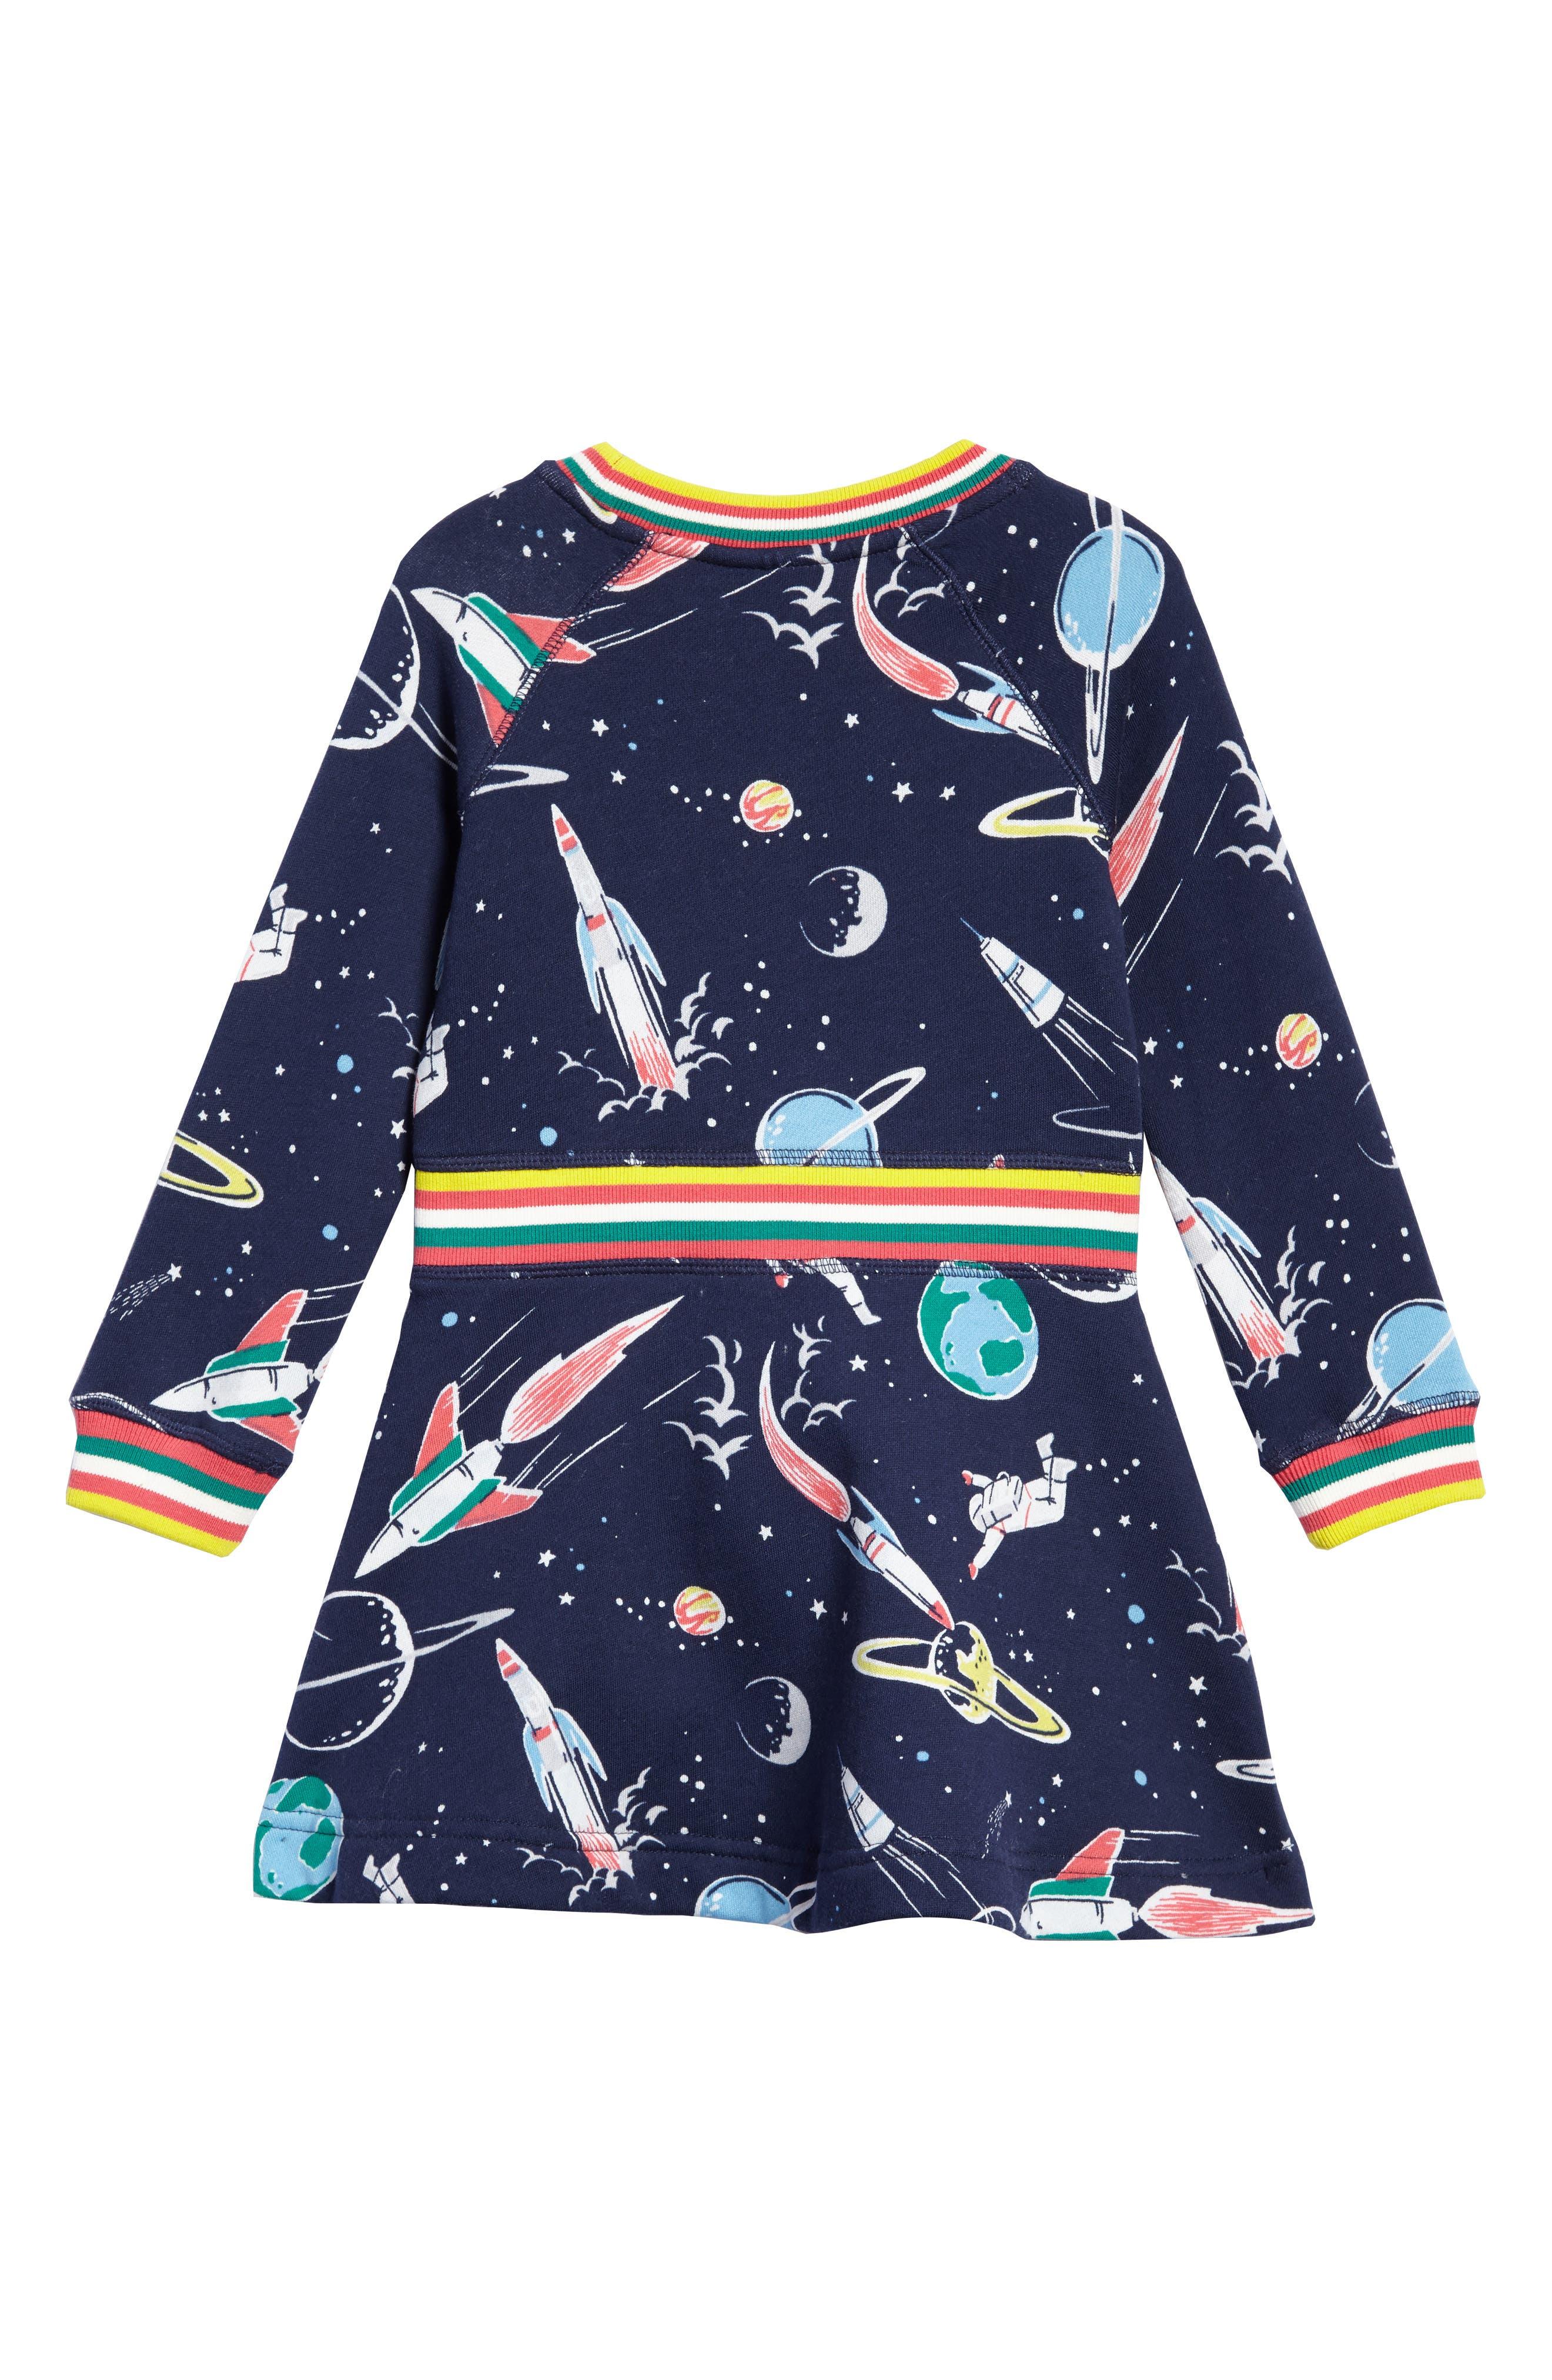 Space Sweatshirt Dress,                             Alternate thumbnail 2, color,                             School Navy Space